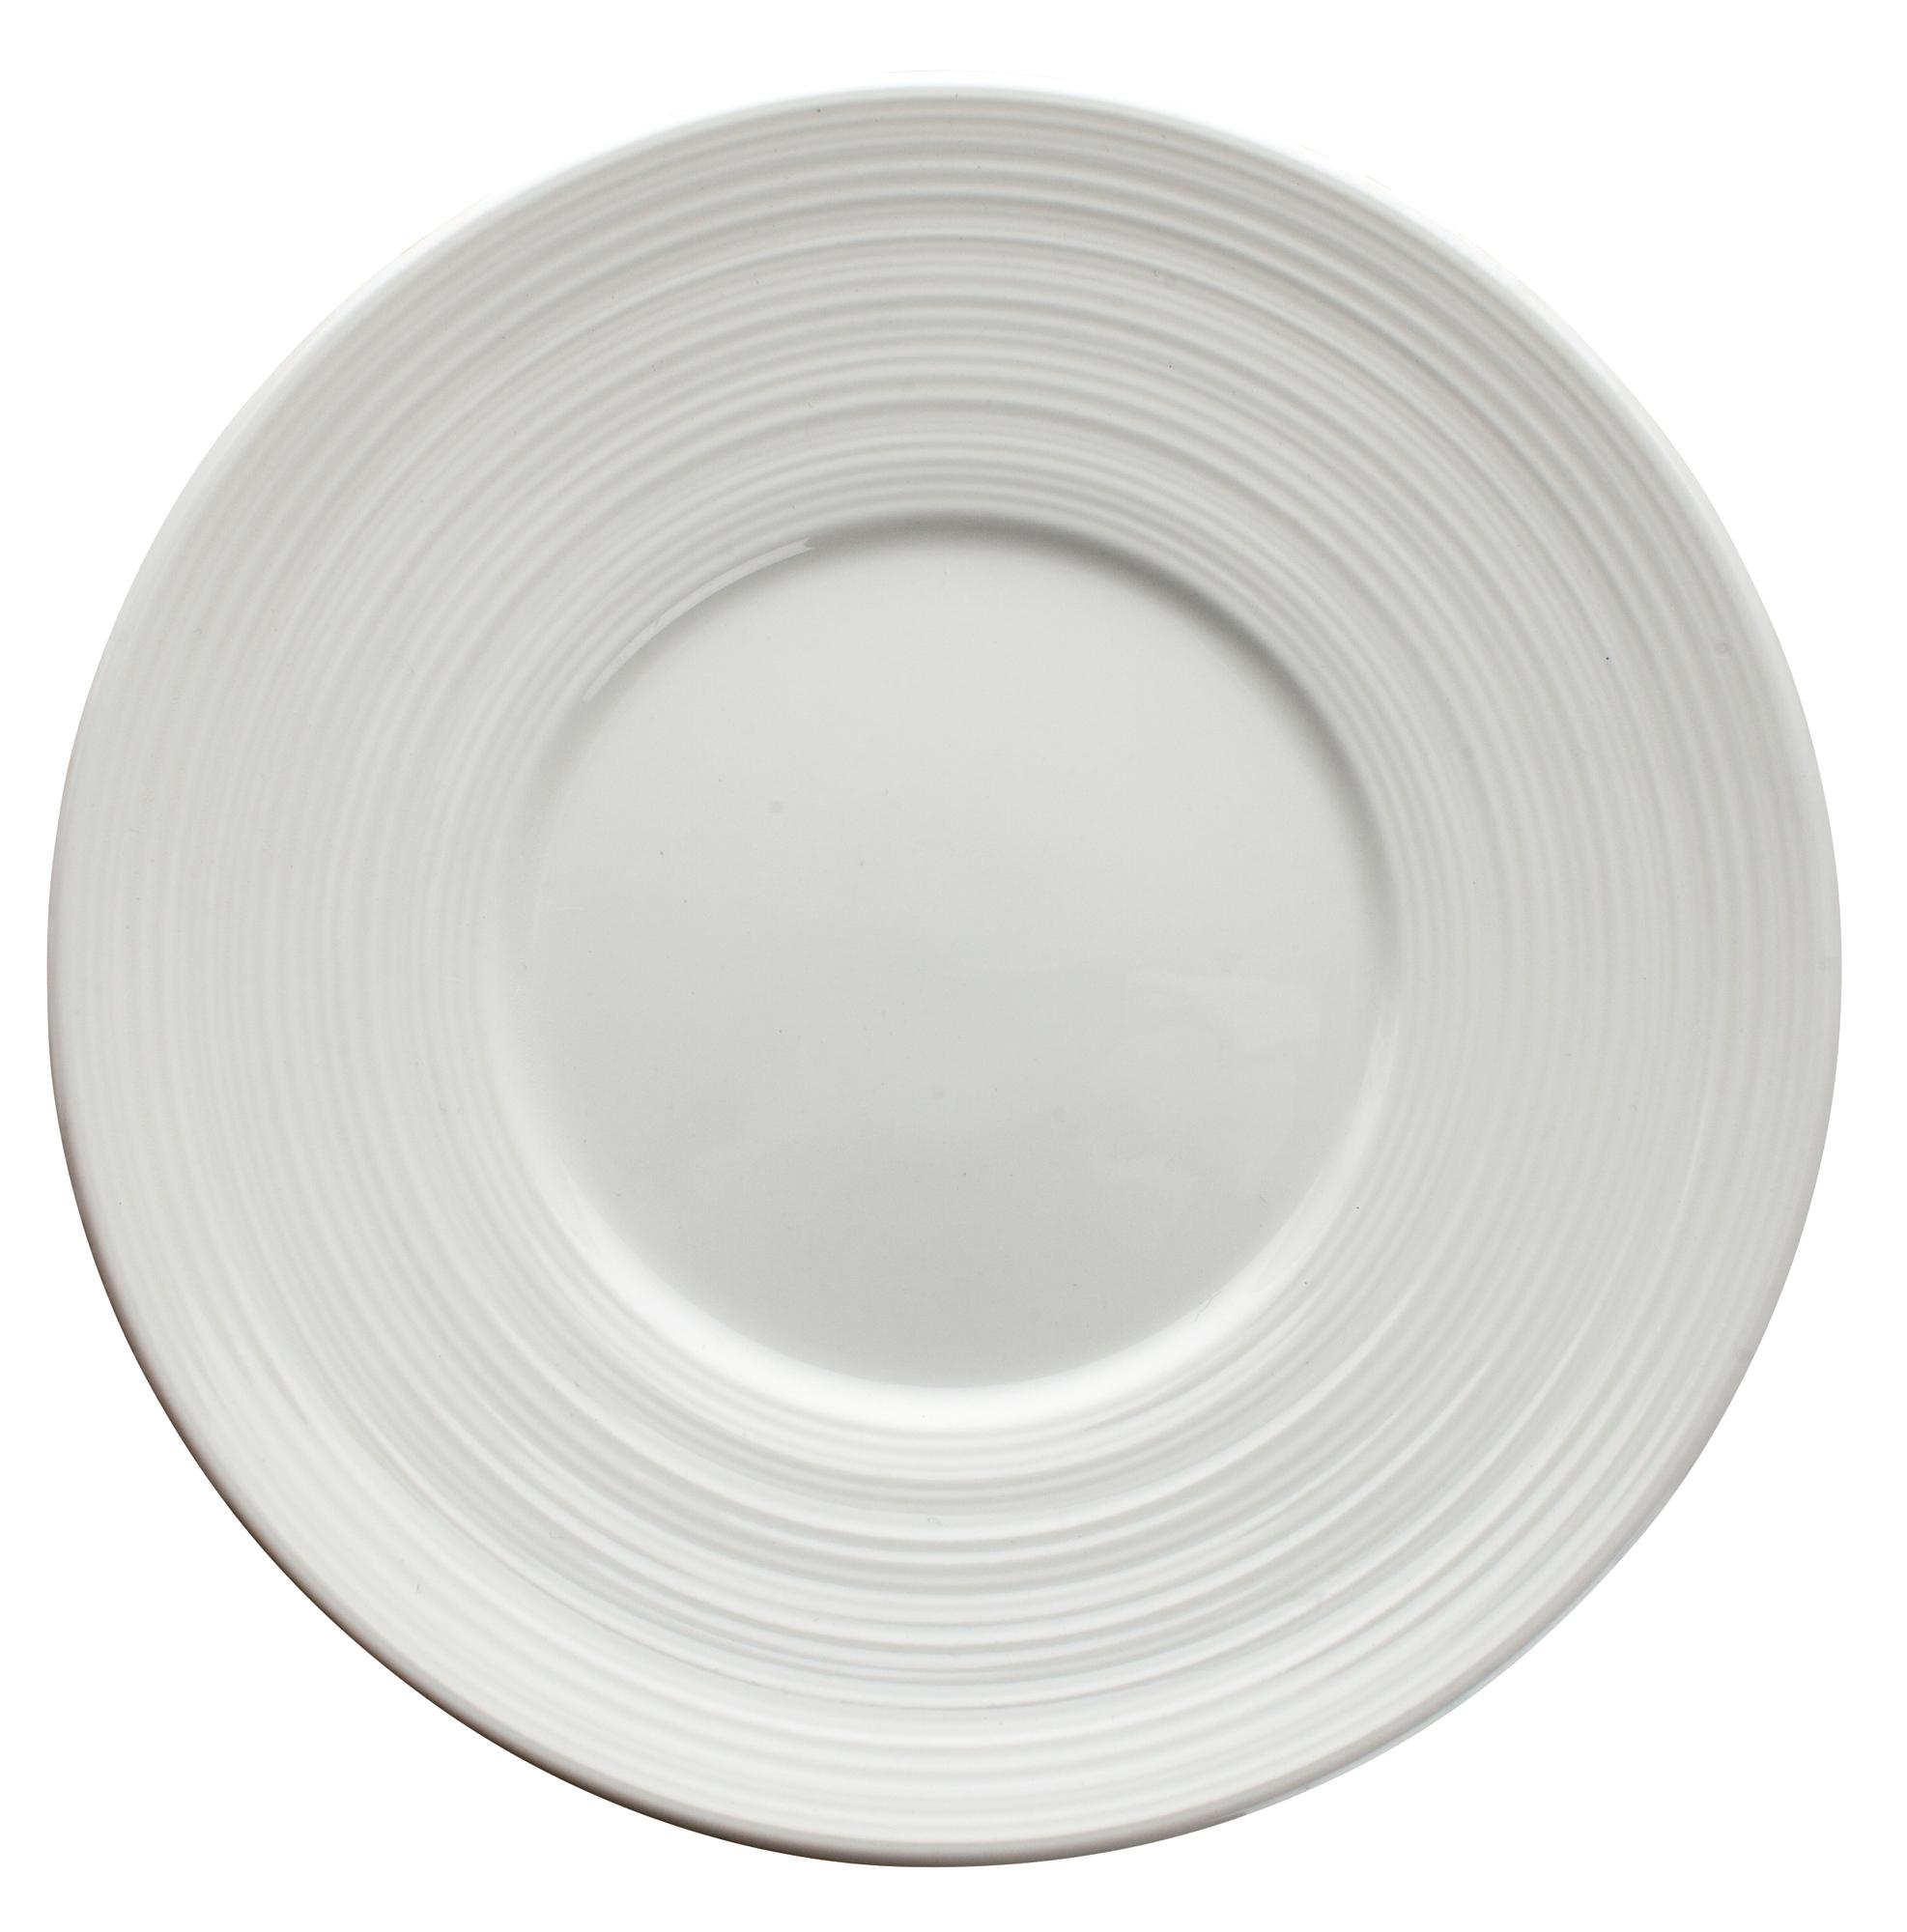 Winco WDP022-105 plate, china